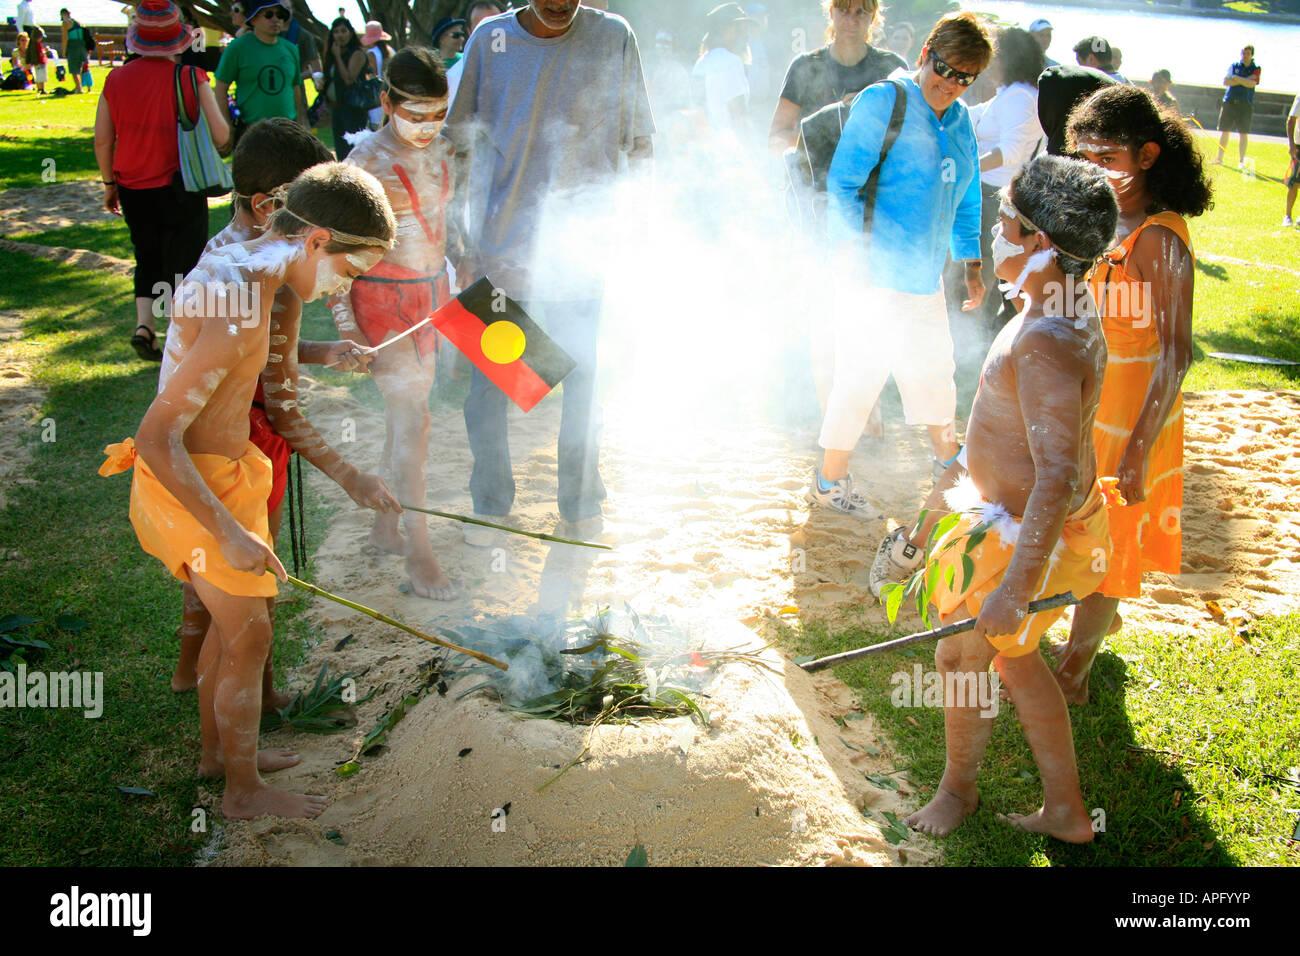 Australia aborigena giorno fumatori cerimonia al Sydney Botanic Gardens Immagini Stock